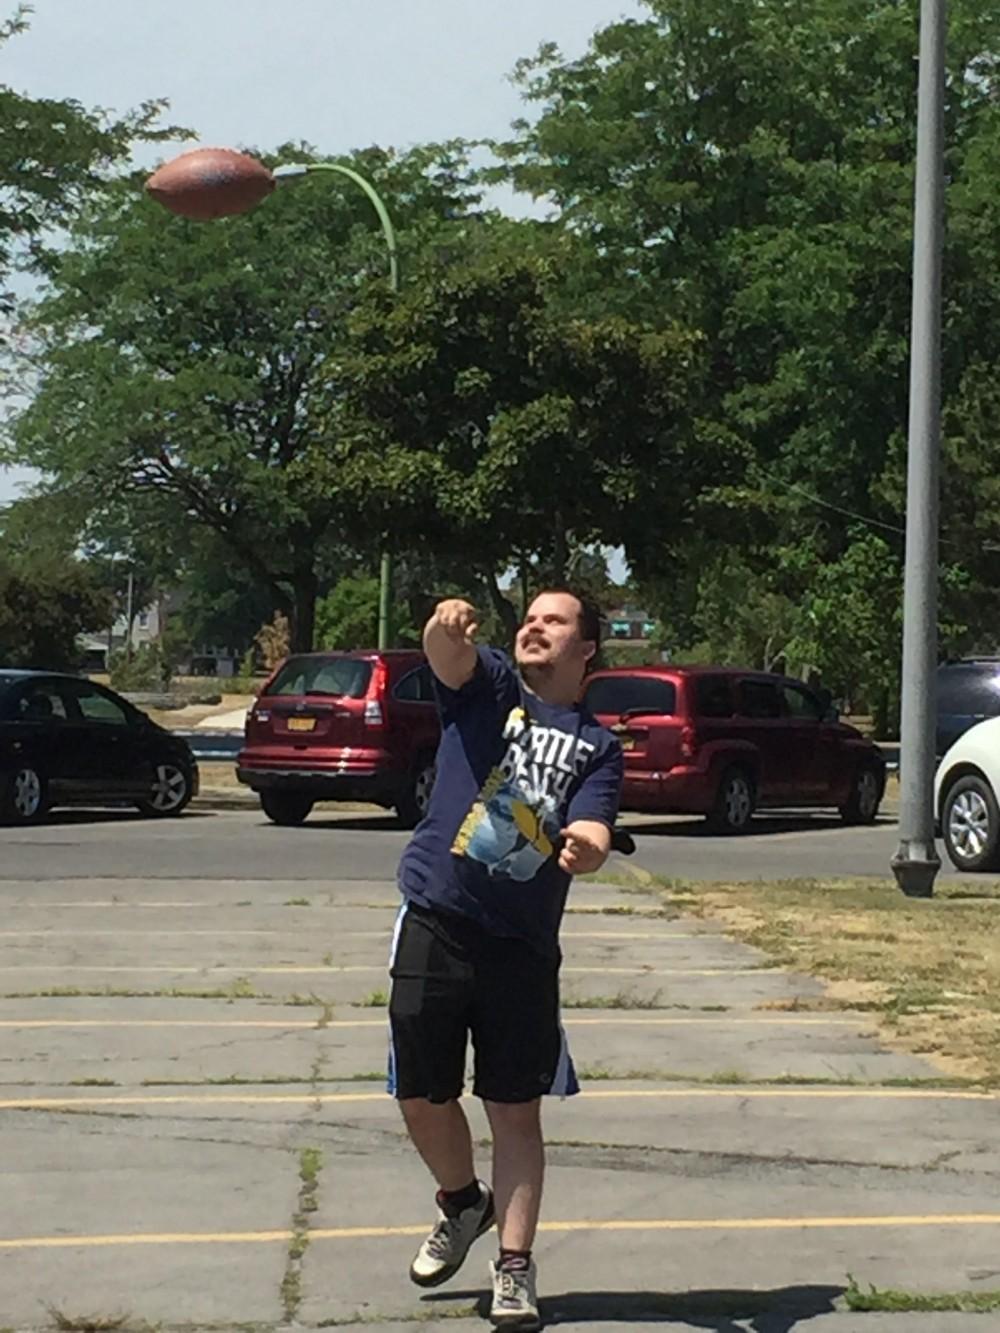 Marshaun throwing football